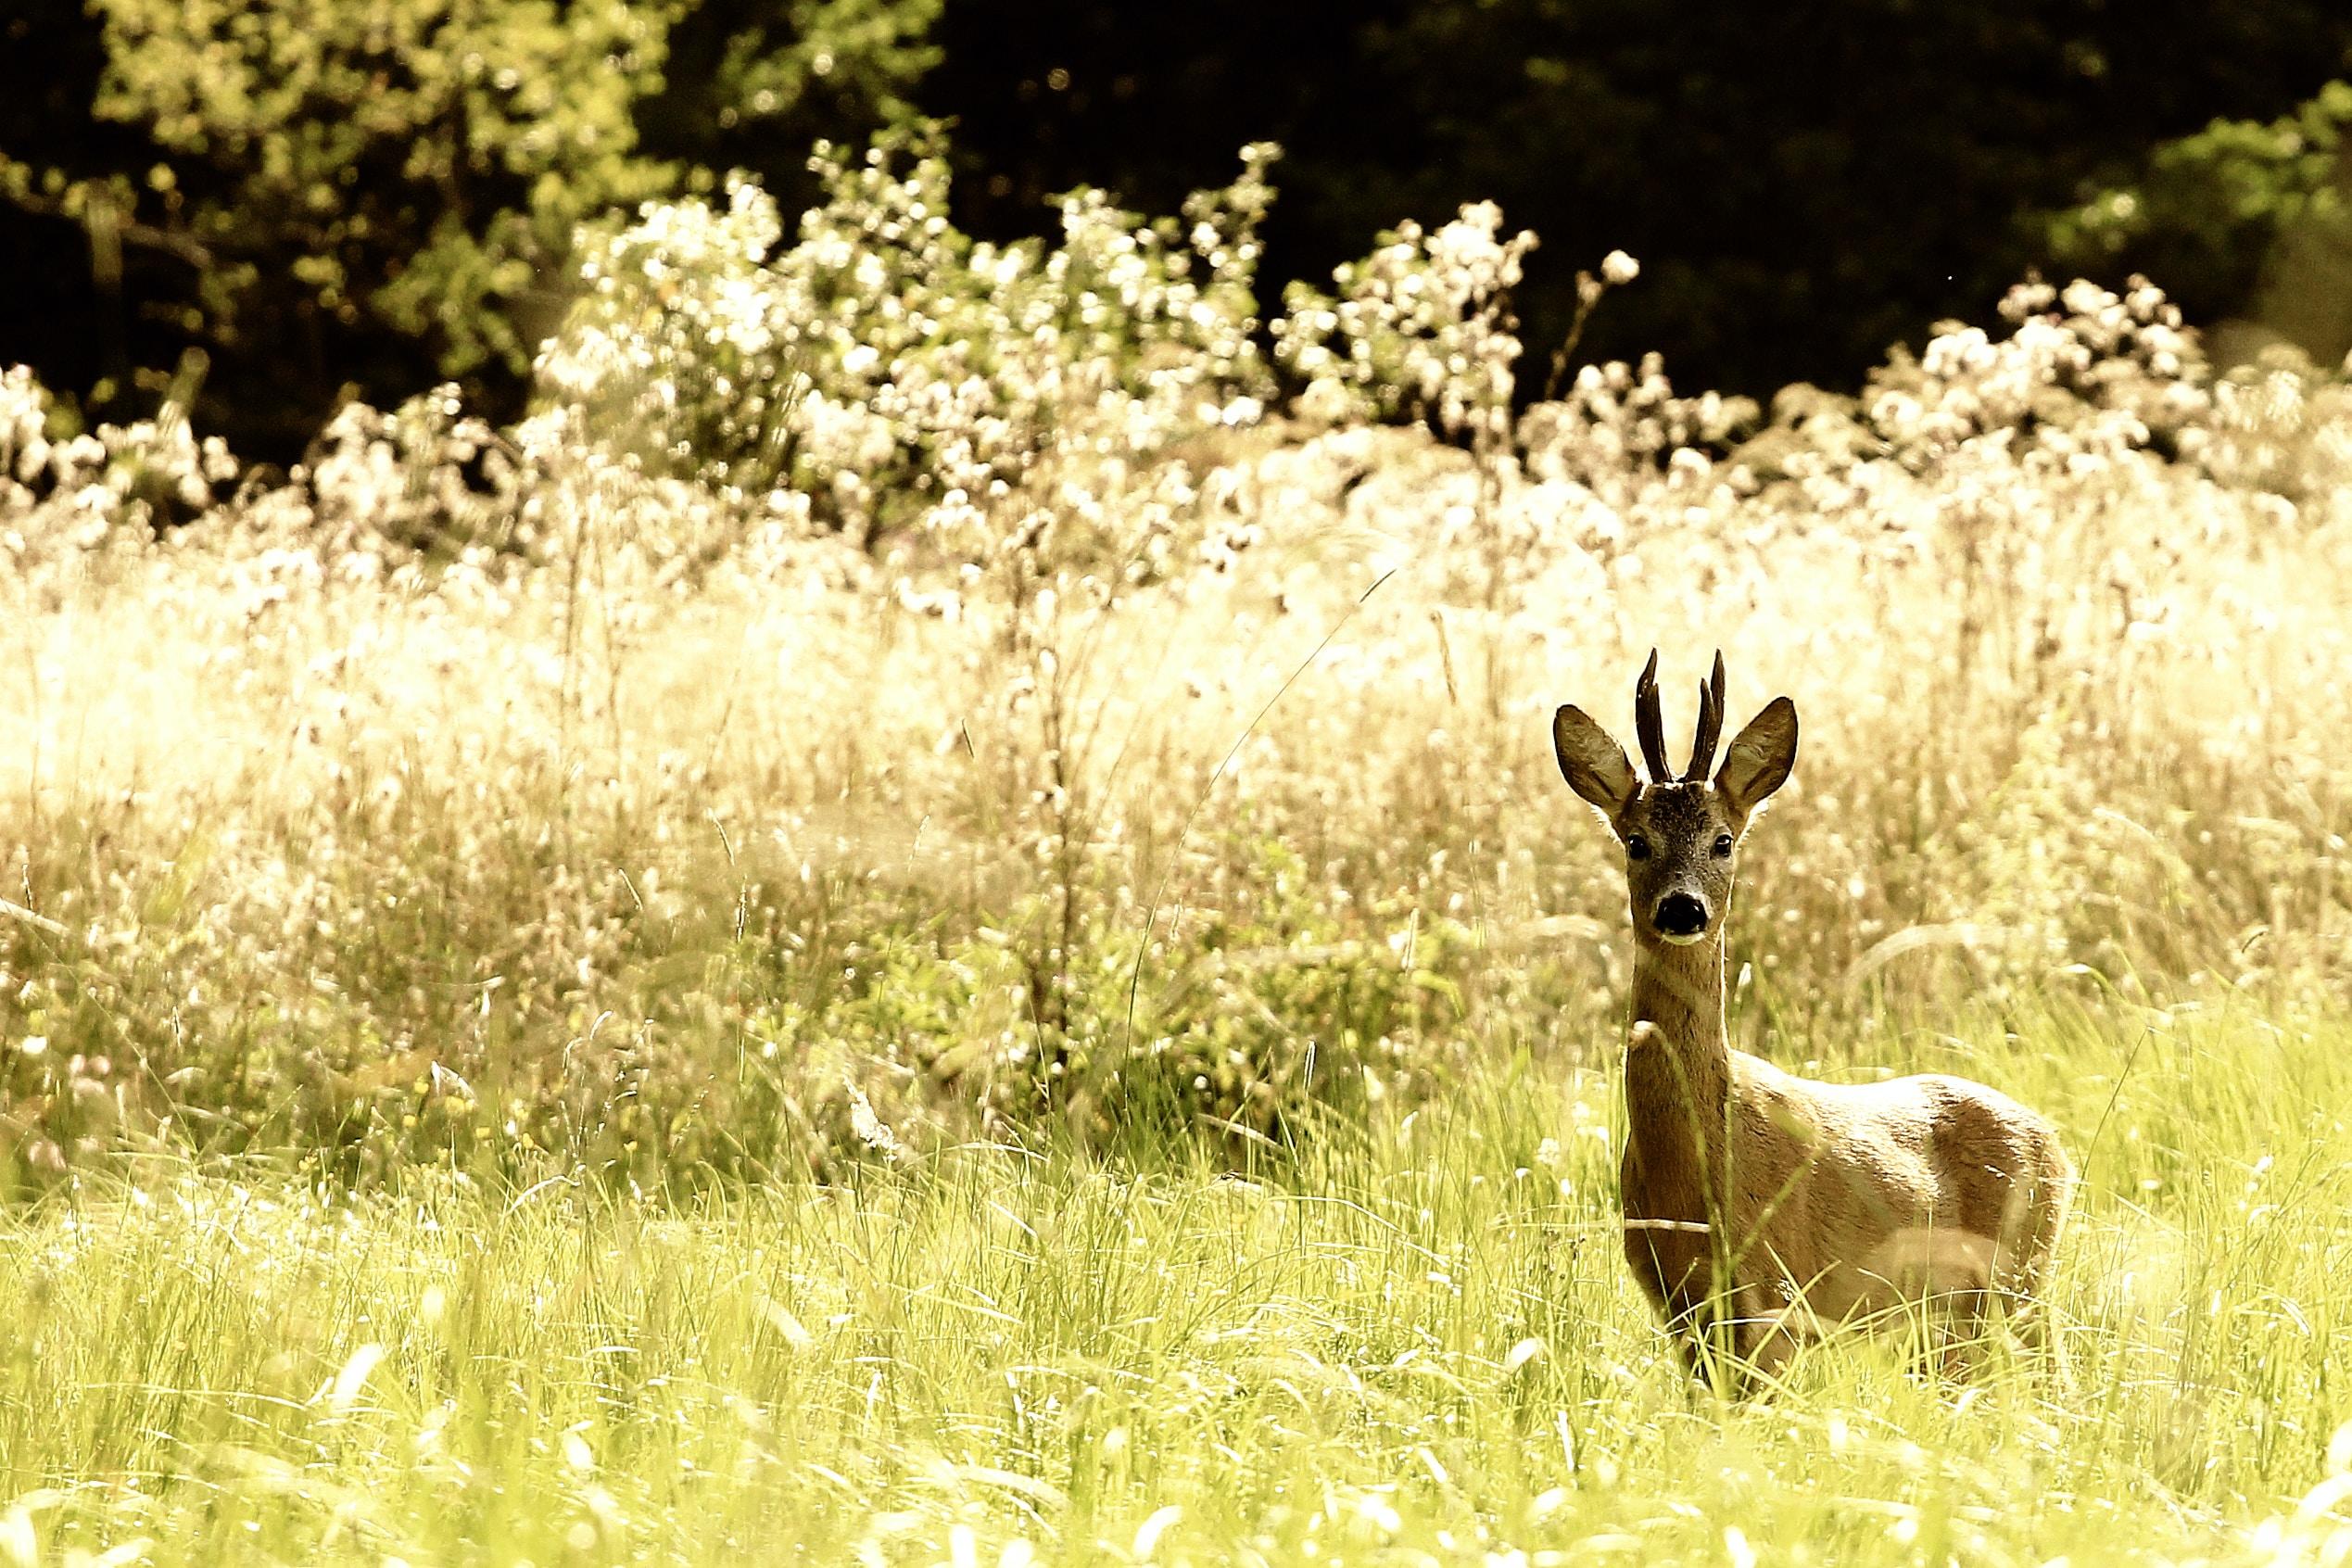 deer on grass field during daytime